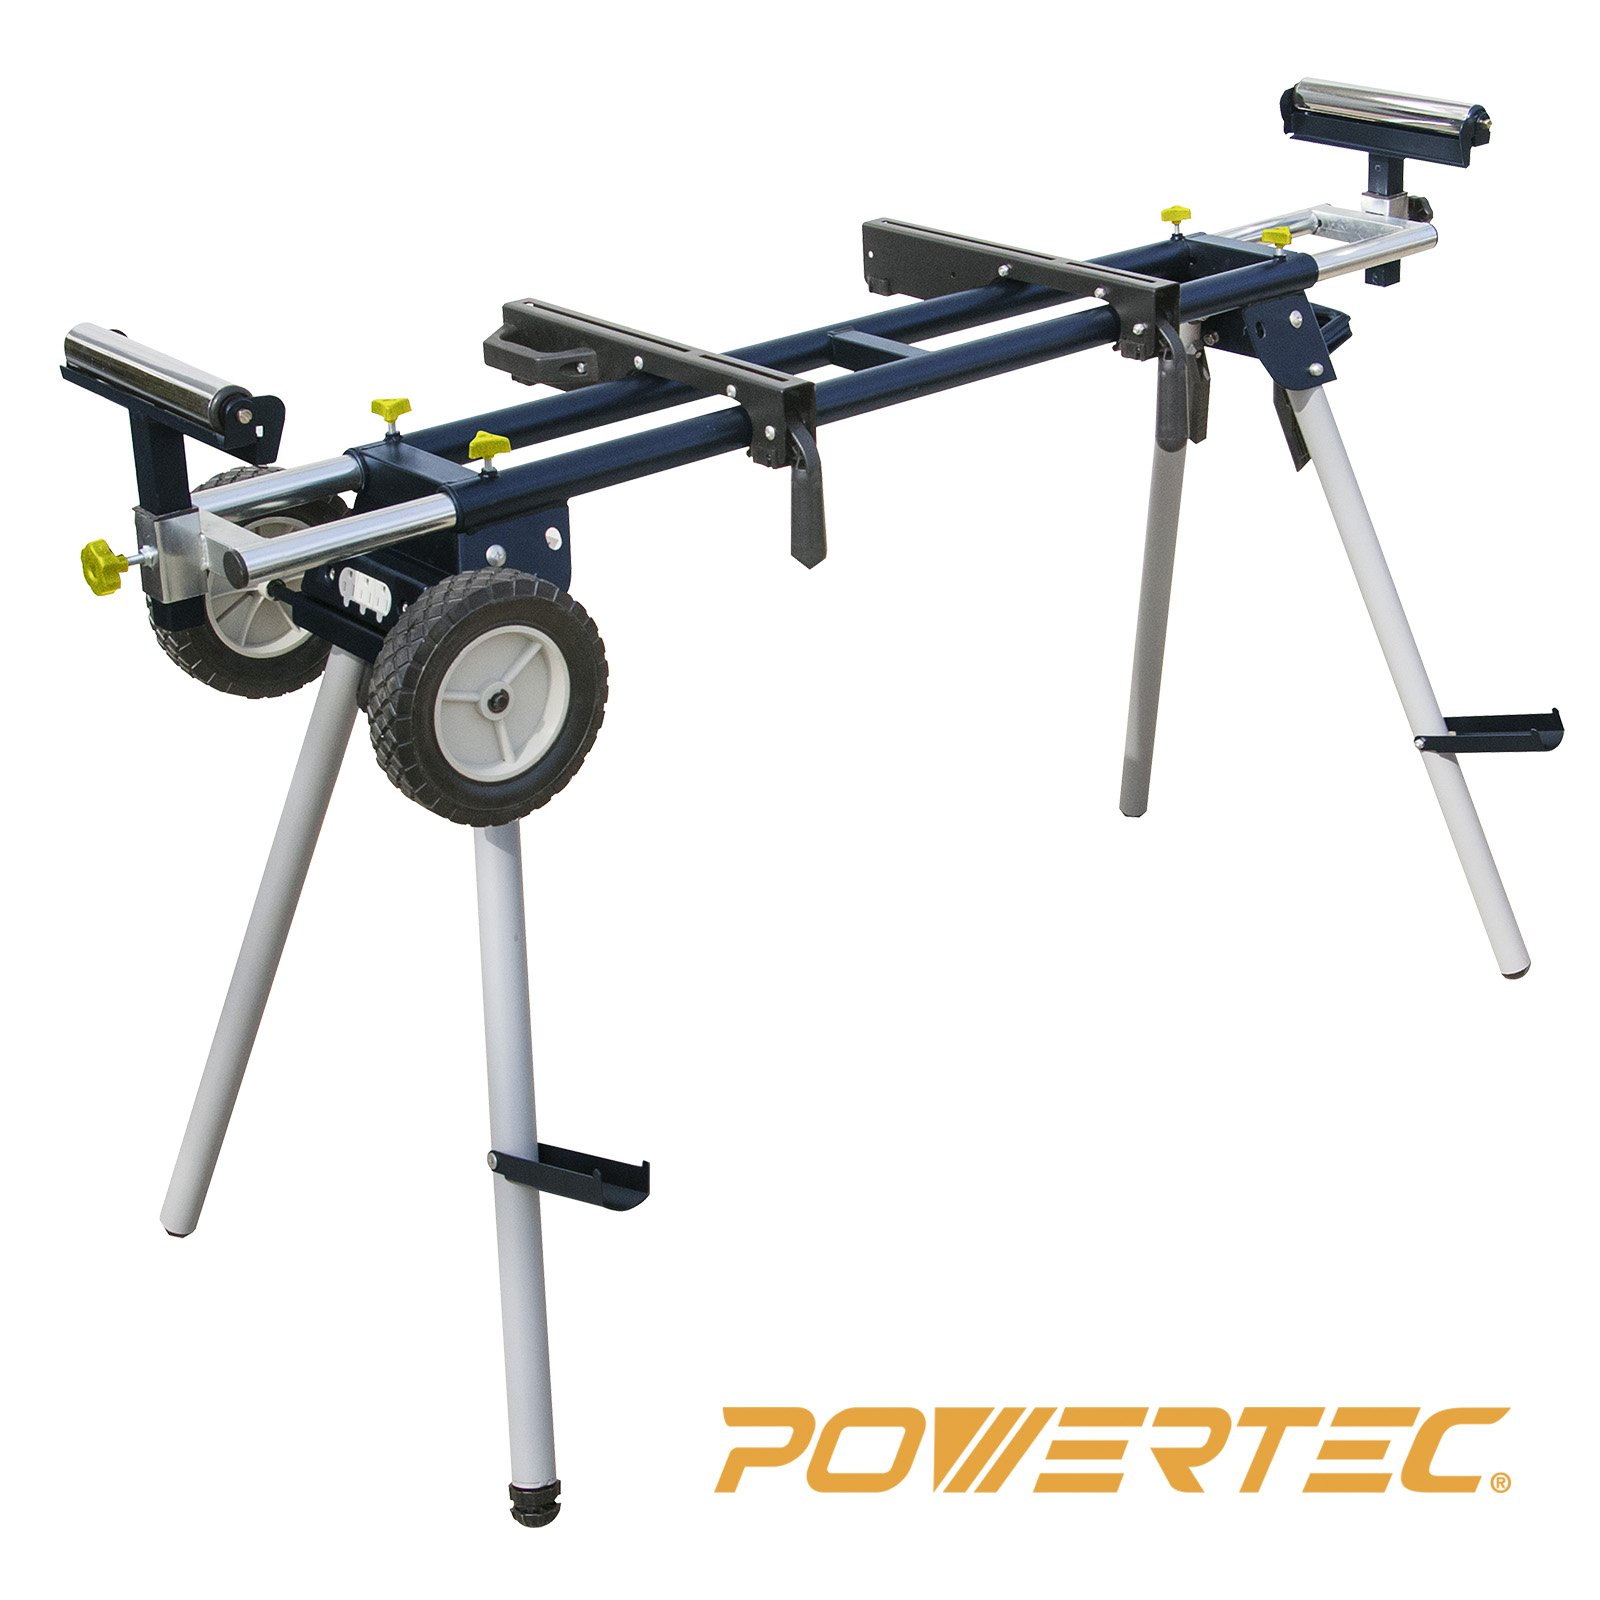 POWERTEC MT4000 Deluxe Wheels Outlet